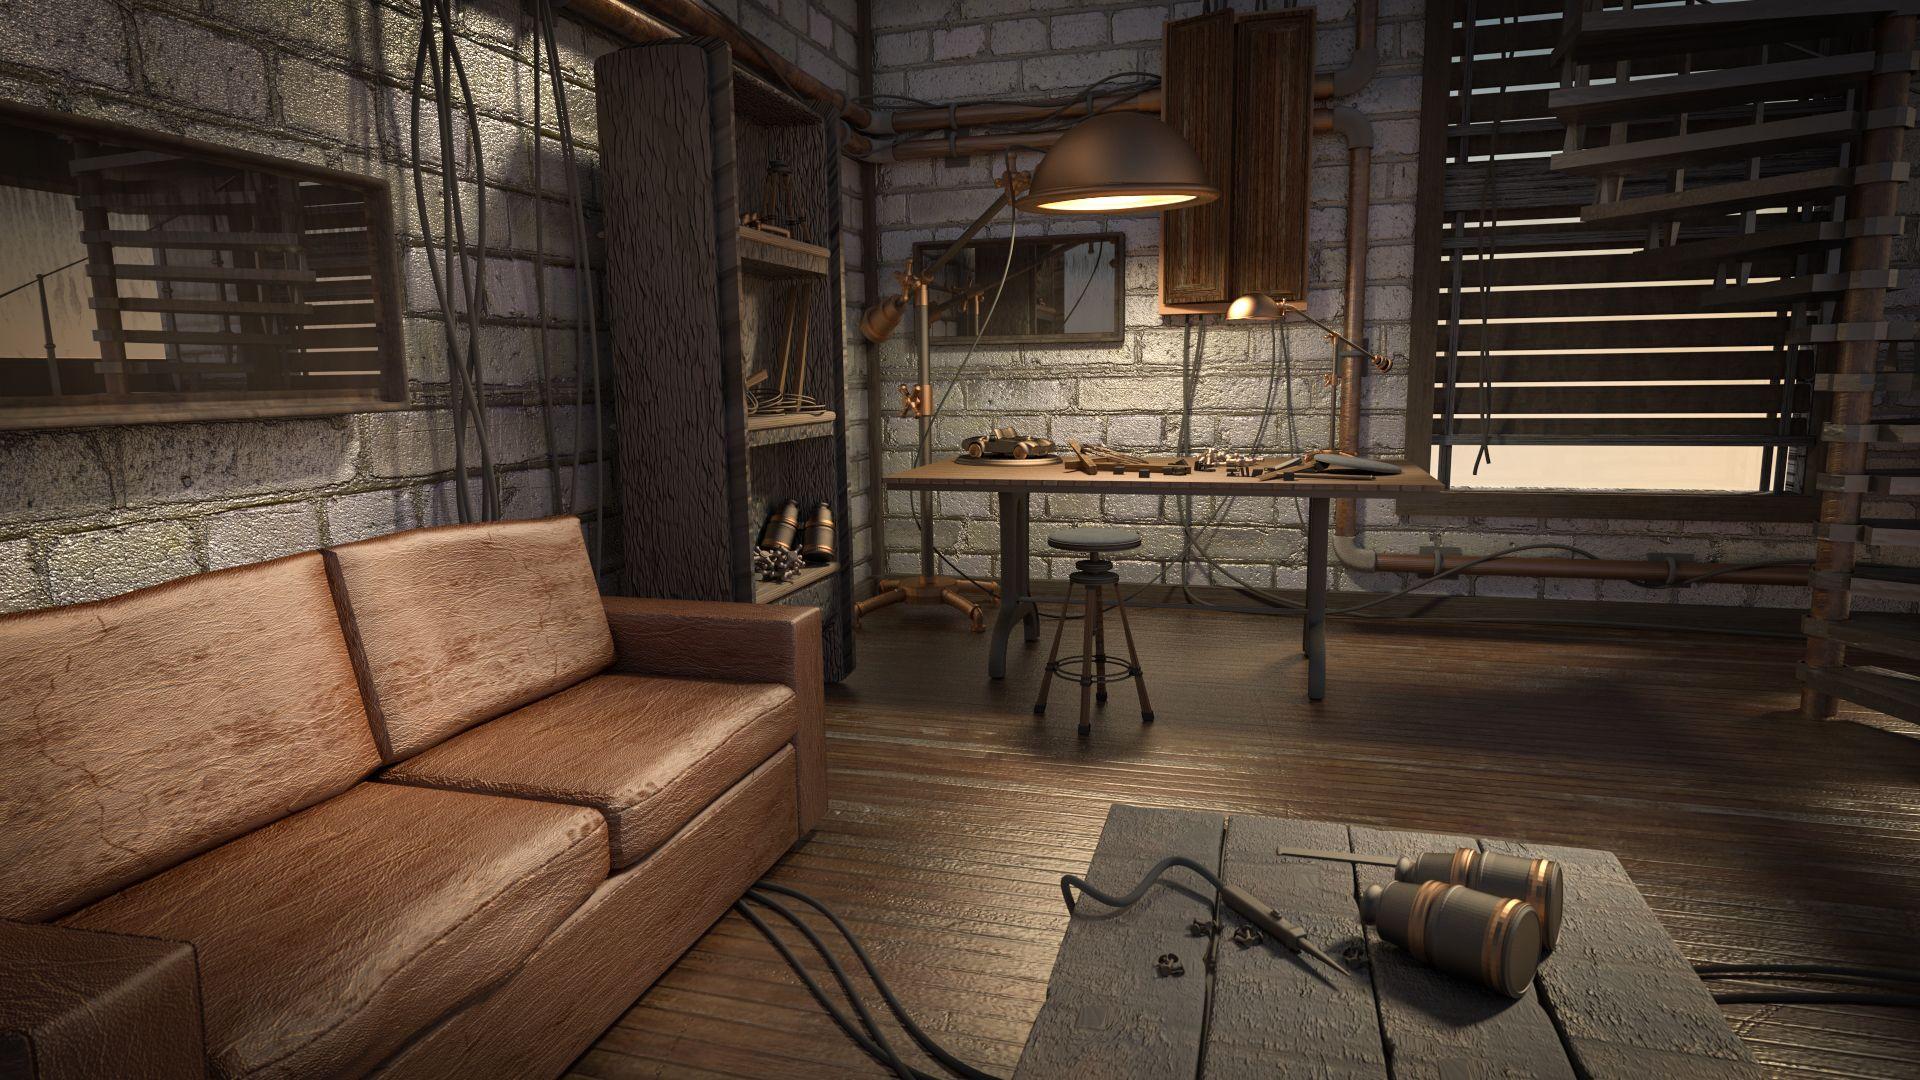 Explore Steampunk Bedroom, Steampunk Interior, And More